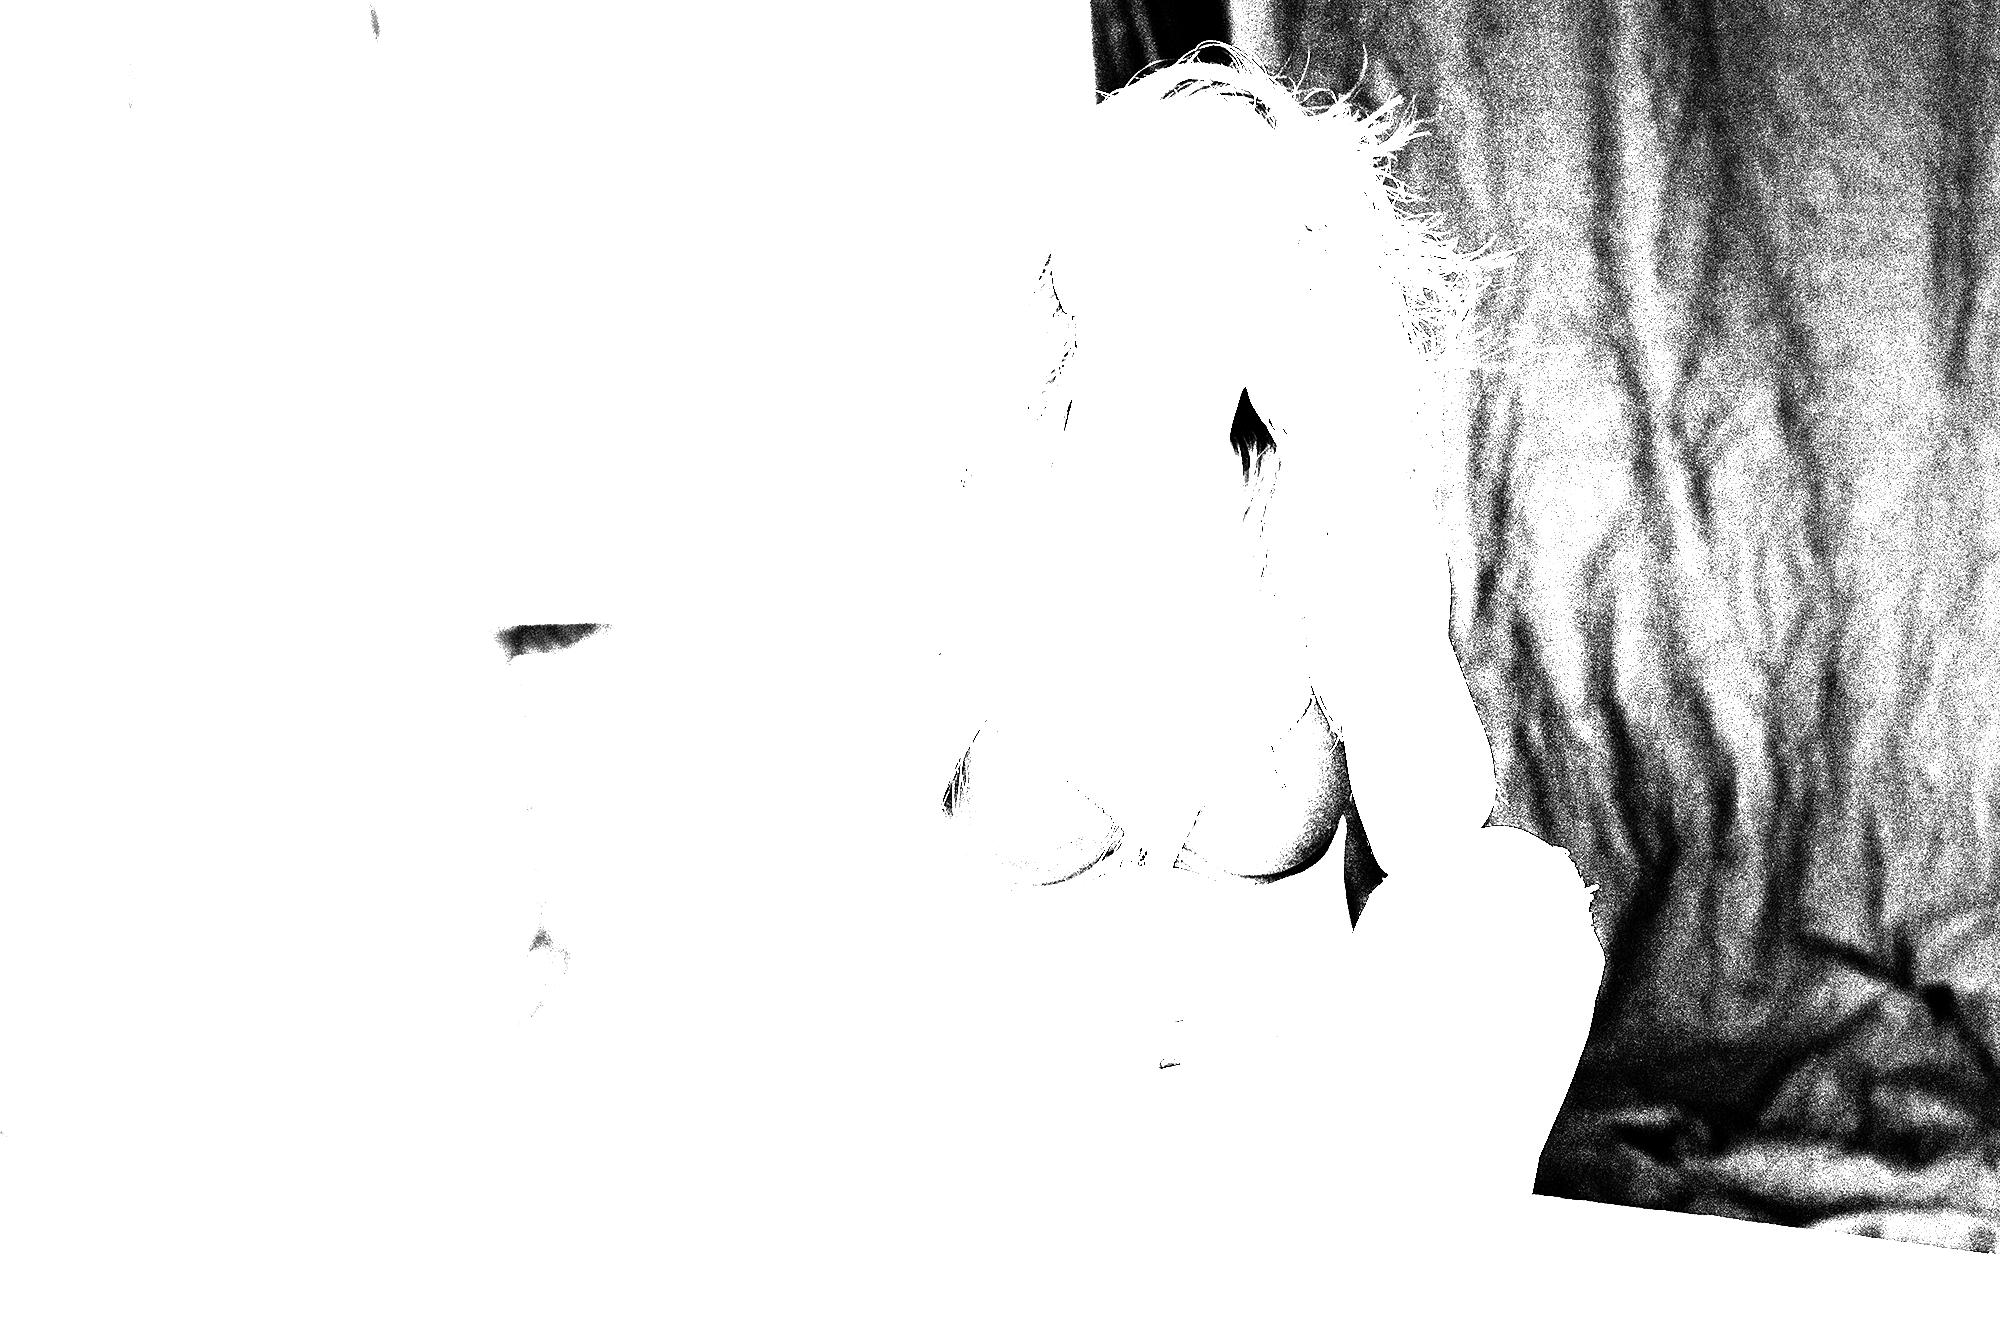 20161231-DSC_1439.png